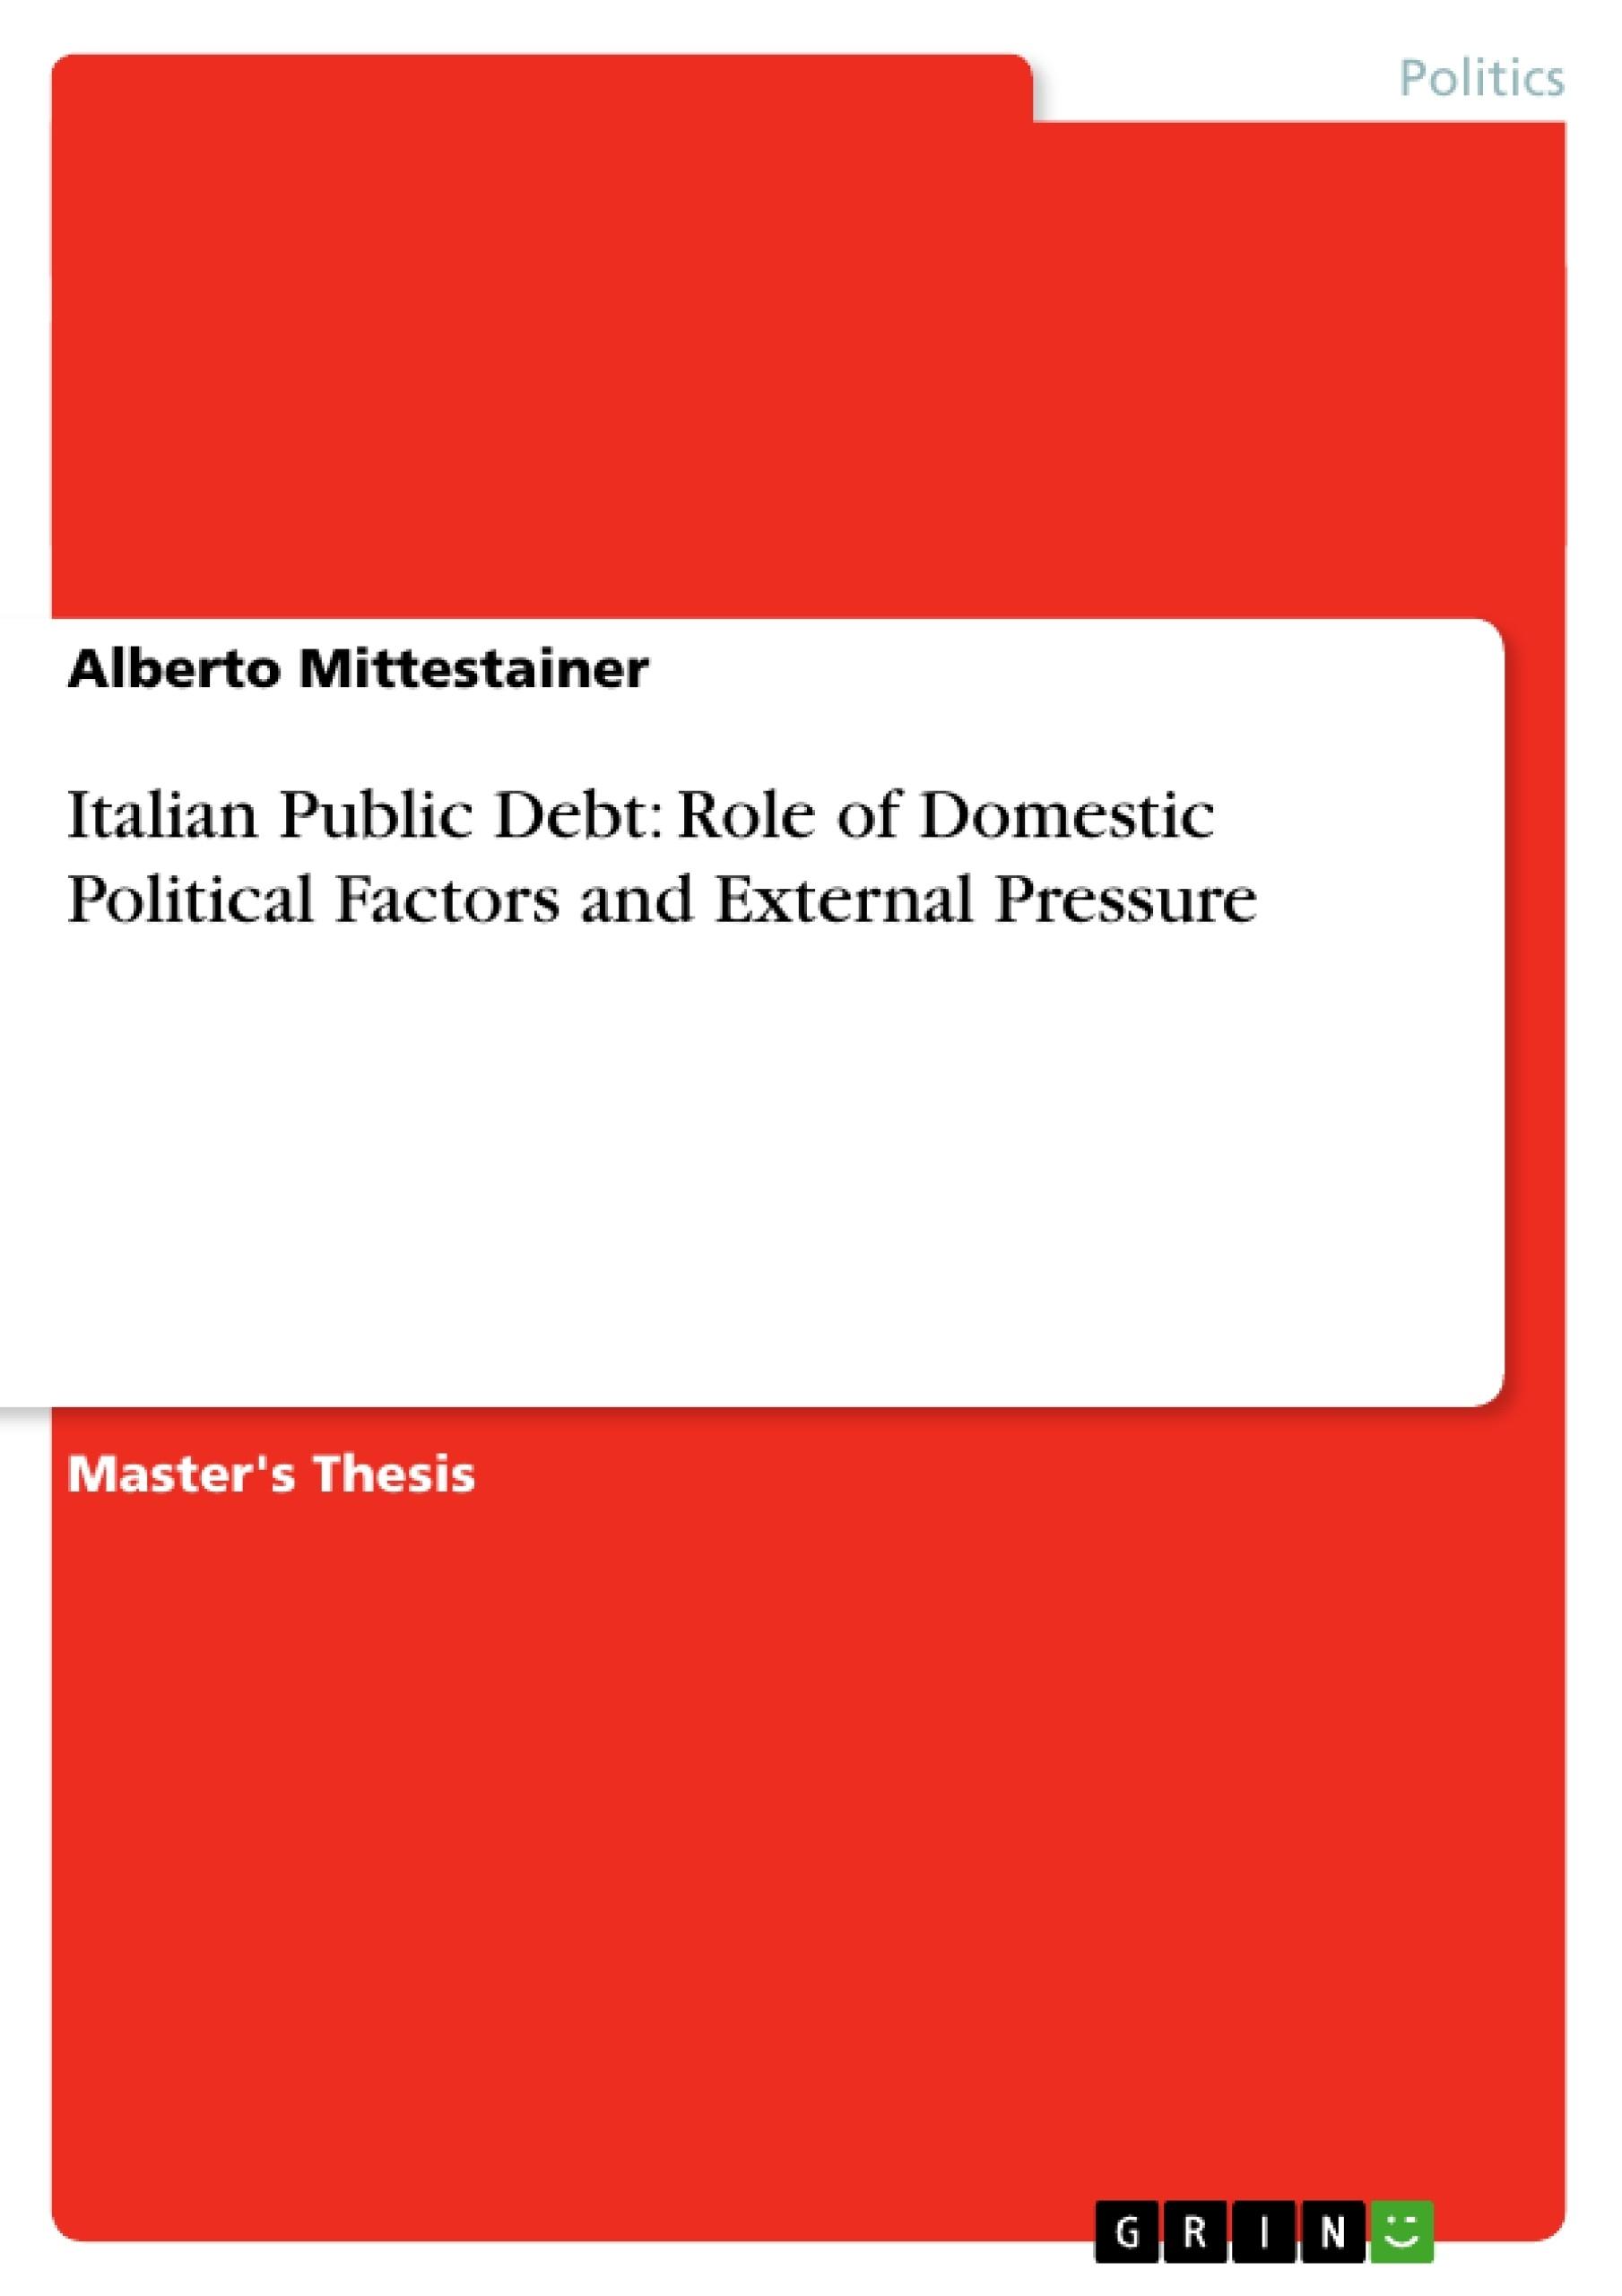 Title: Italian Public Debt: Role of Domestic Political Factors and External Pressure